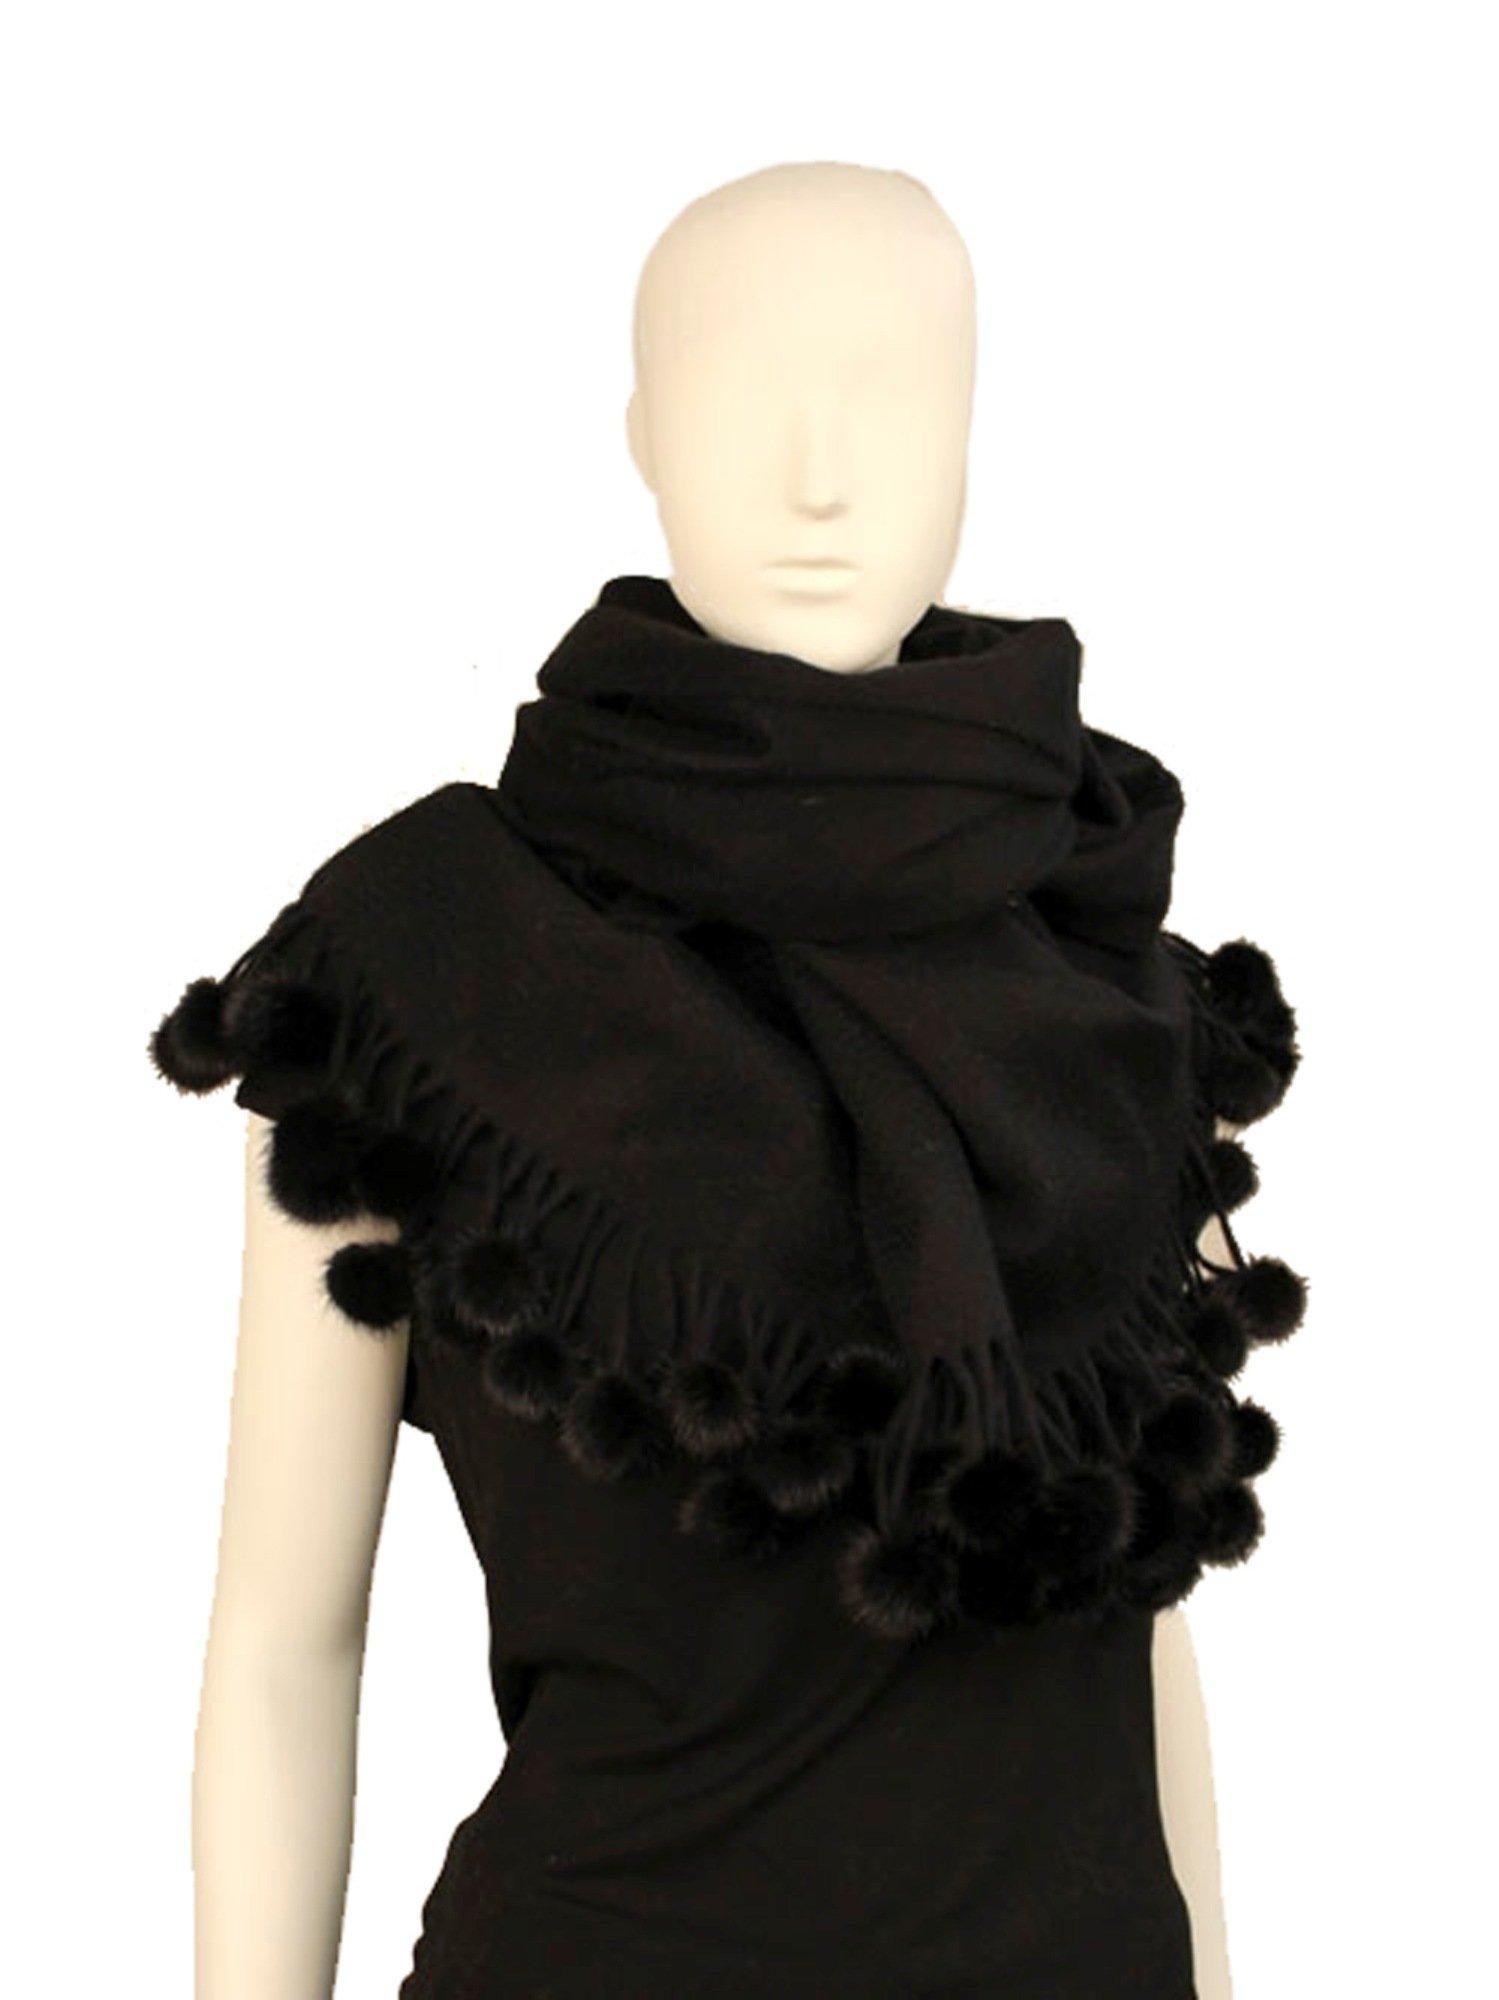 Cashmere scarf/Cashmere shawl with Mink Pom-Pom balls -Cashmere Pashmina Group (Black) by Cashmere Pashmina Group